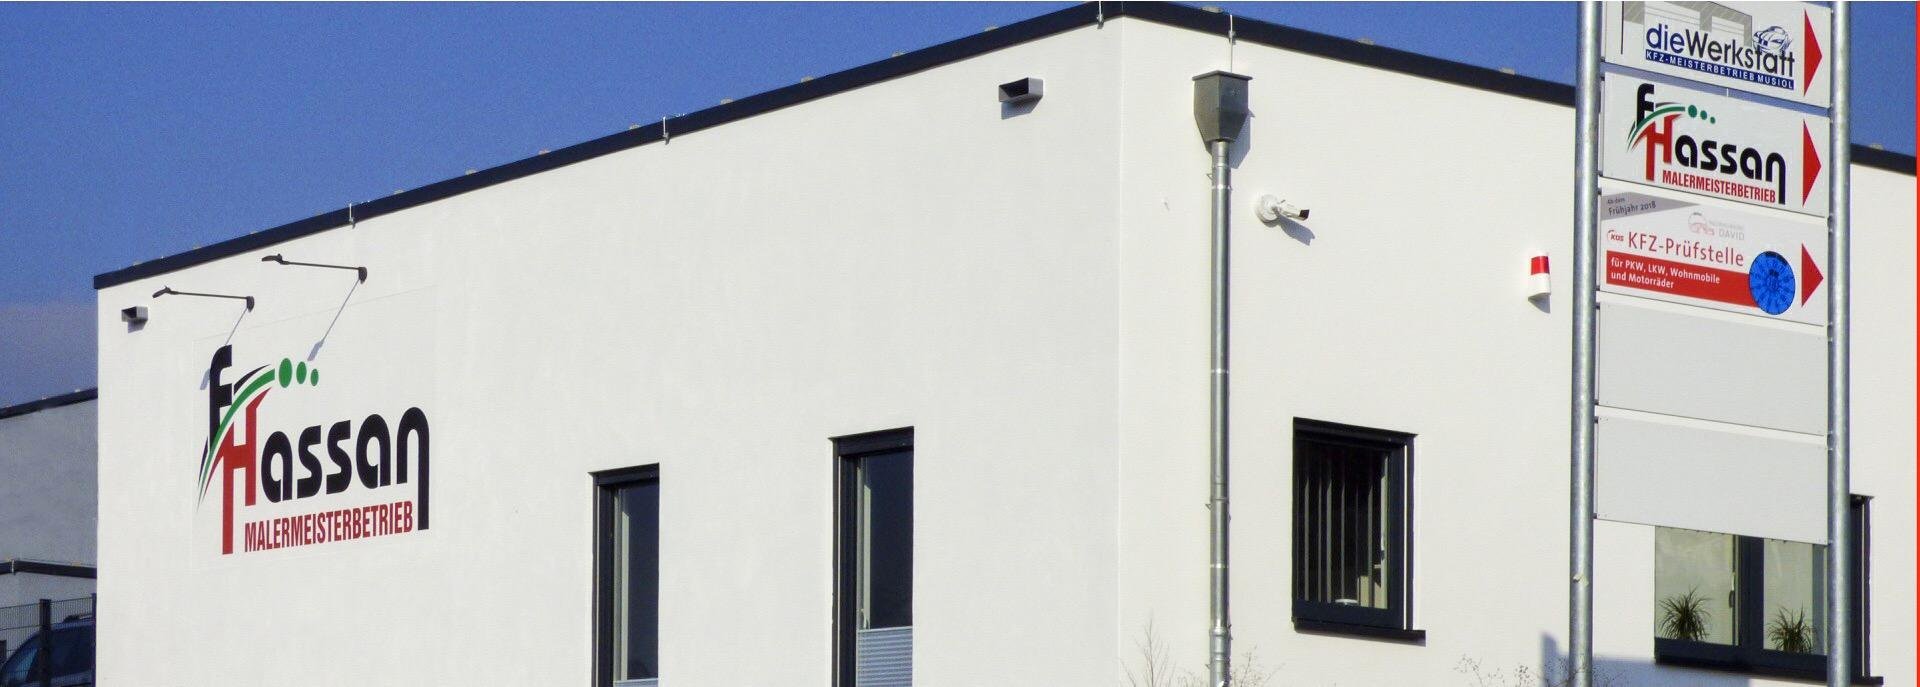 Gebäude F.Hassan, Lahnstein